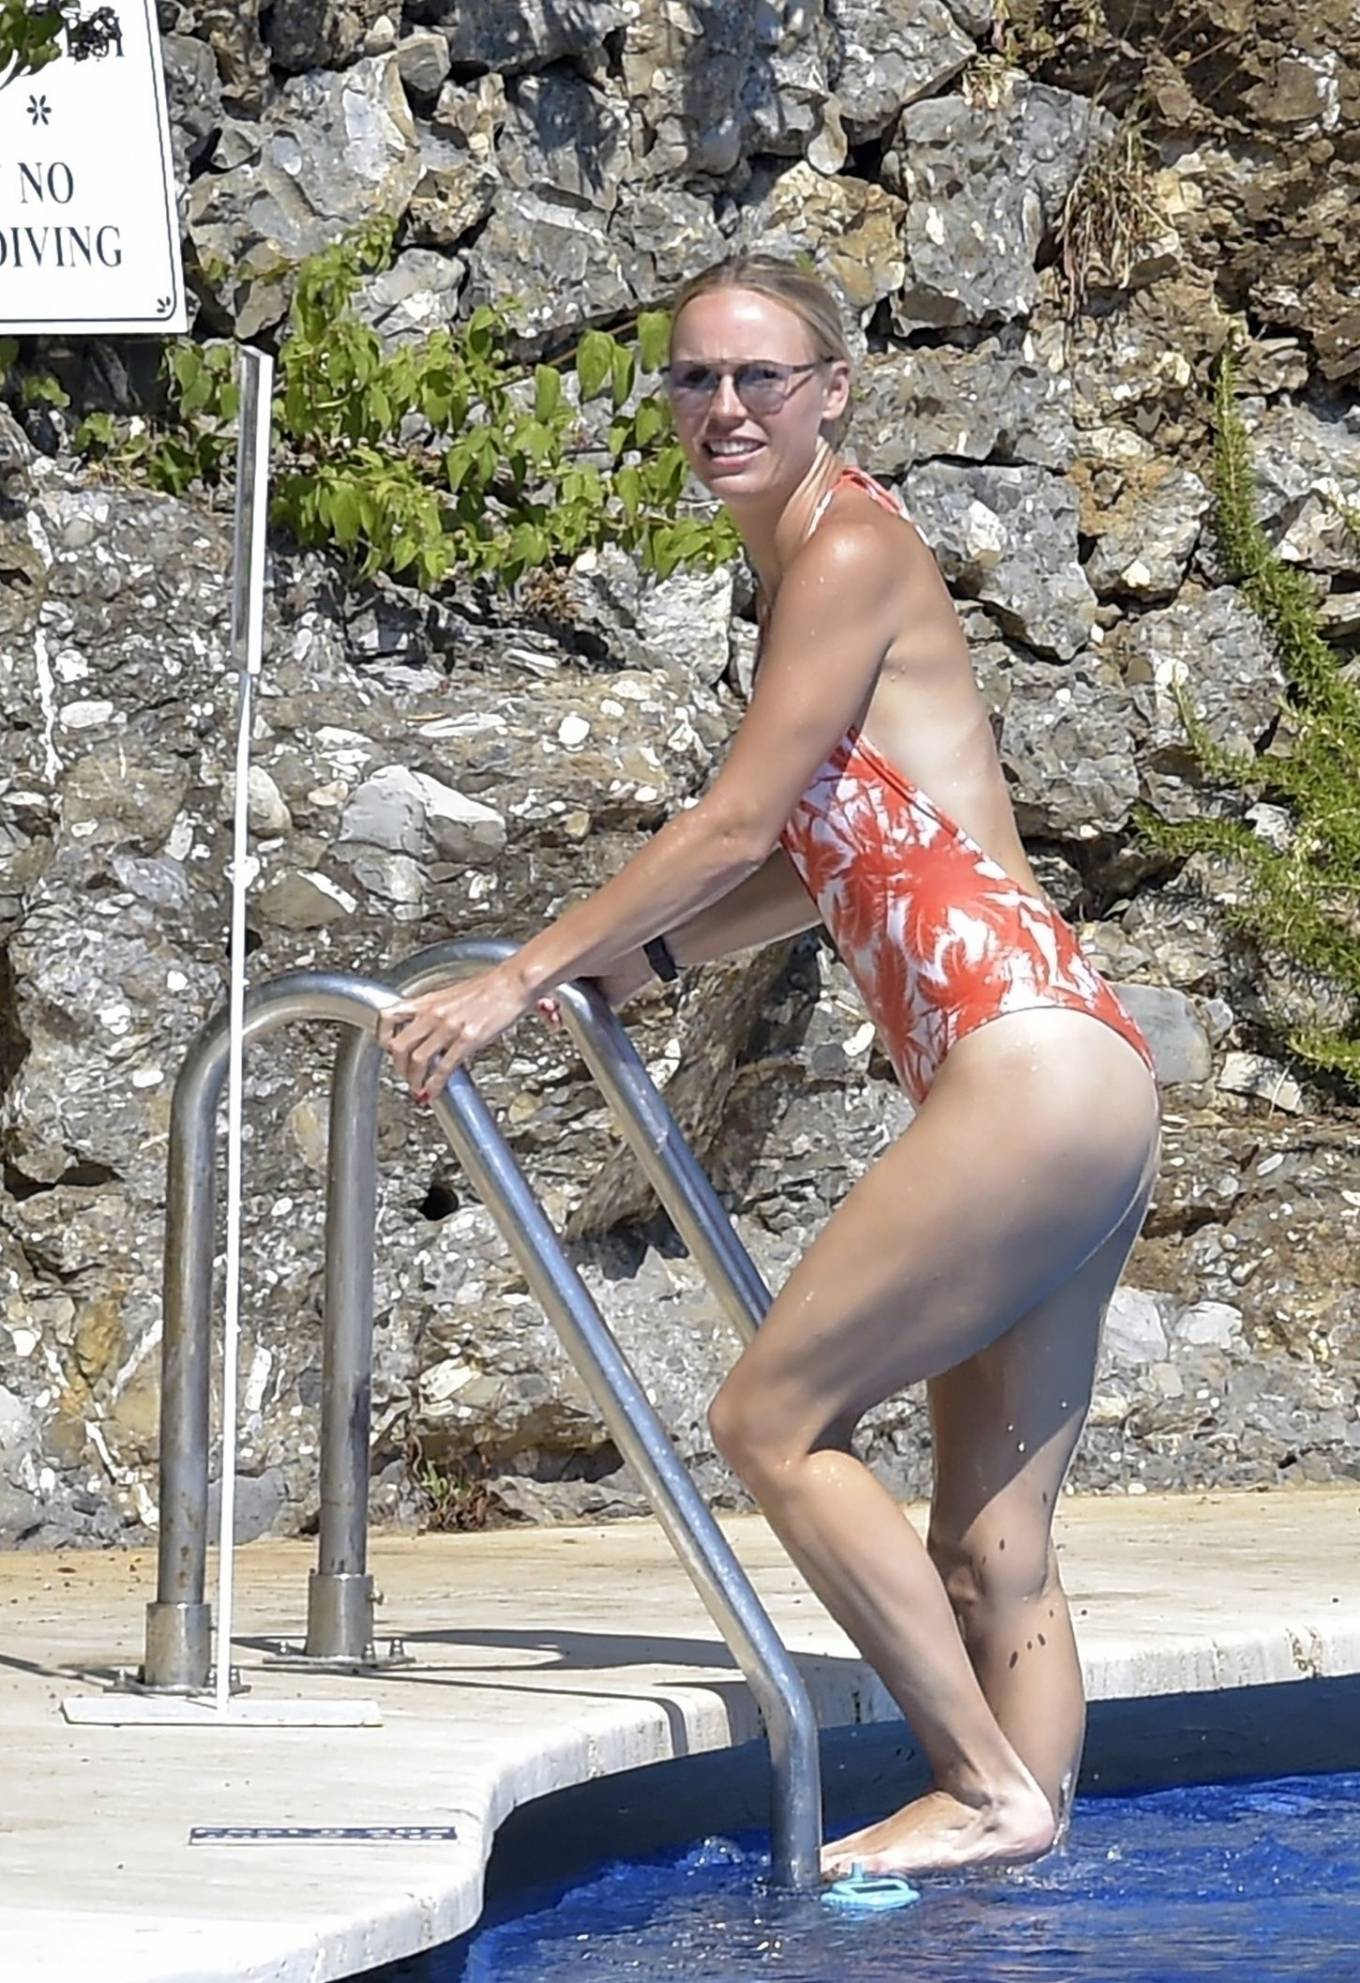 Caroline Wozniacki - In a bikini at a pool in Portofino